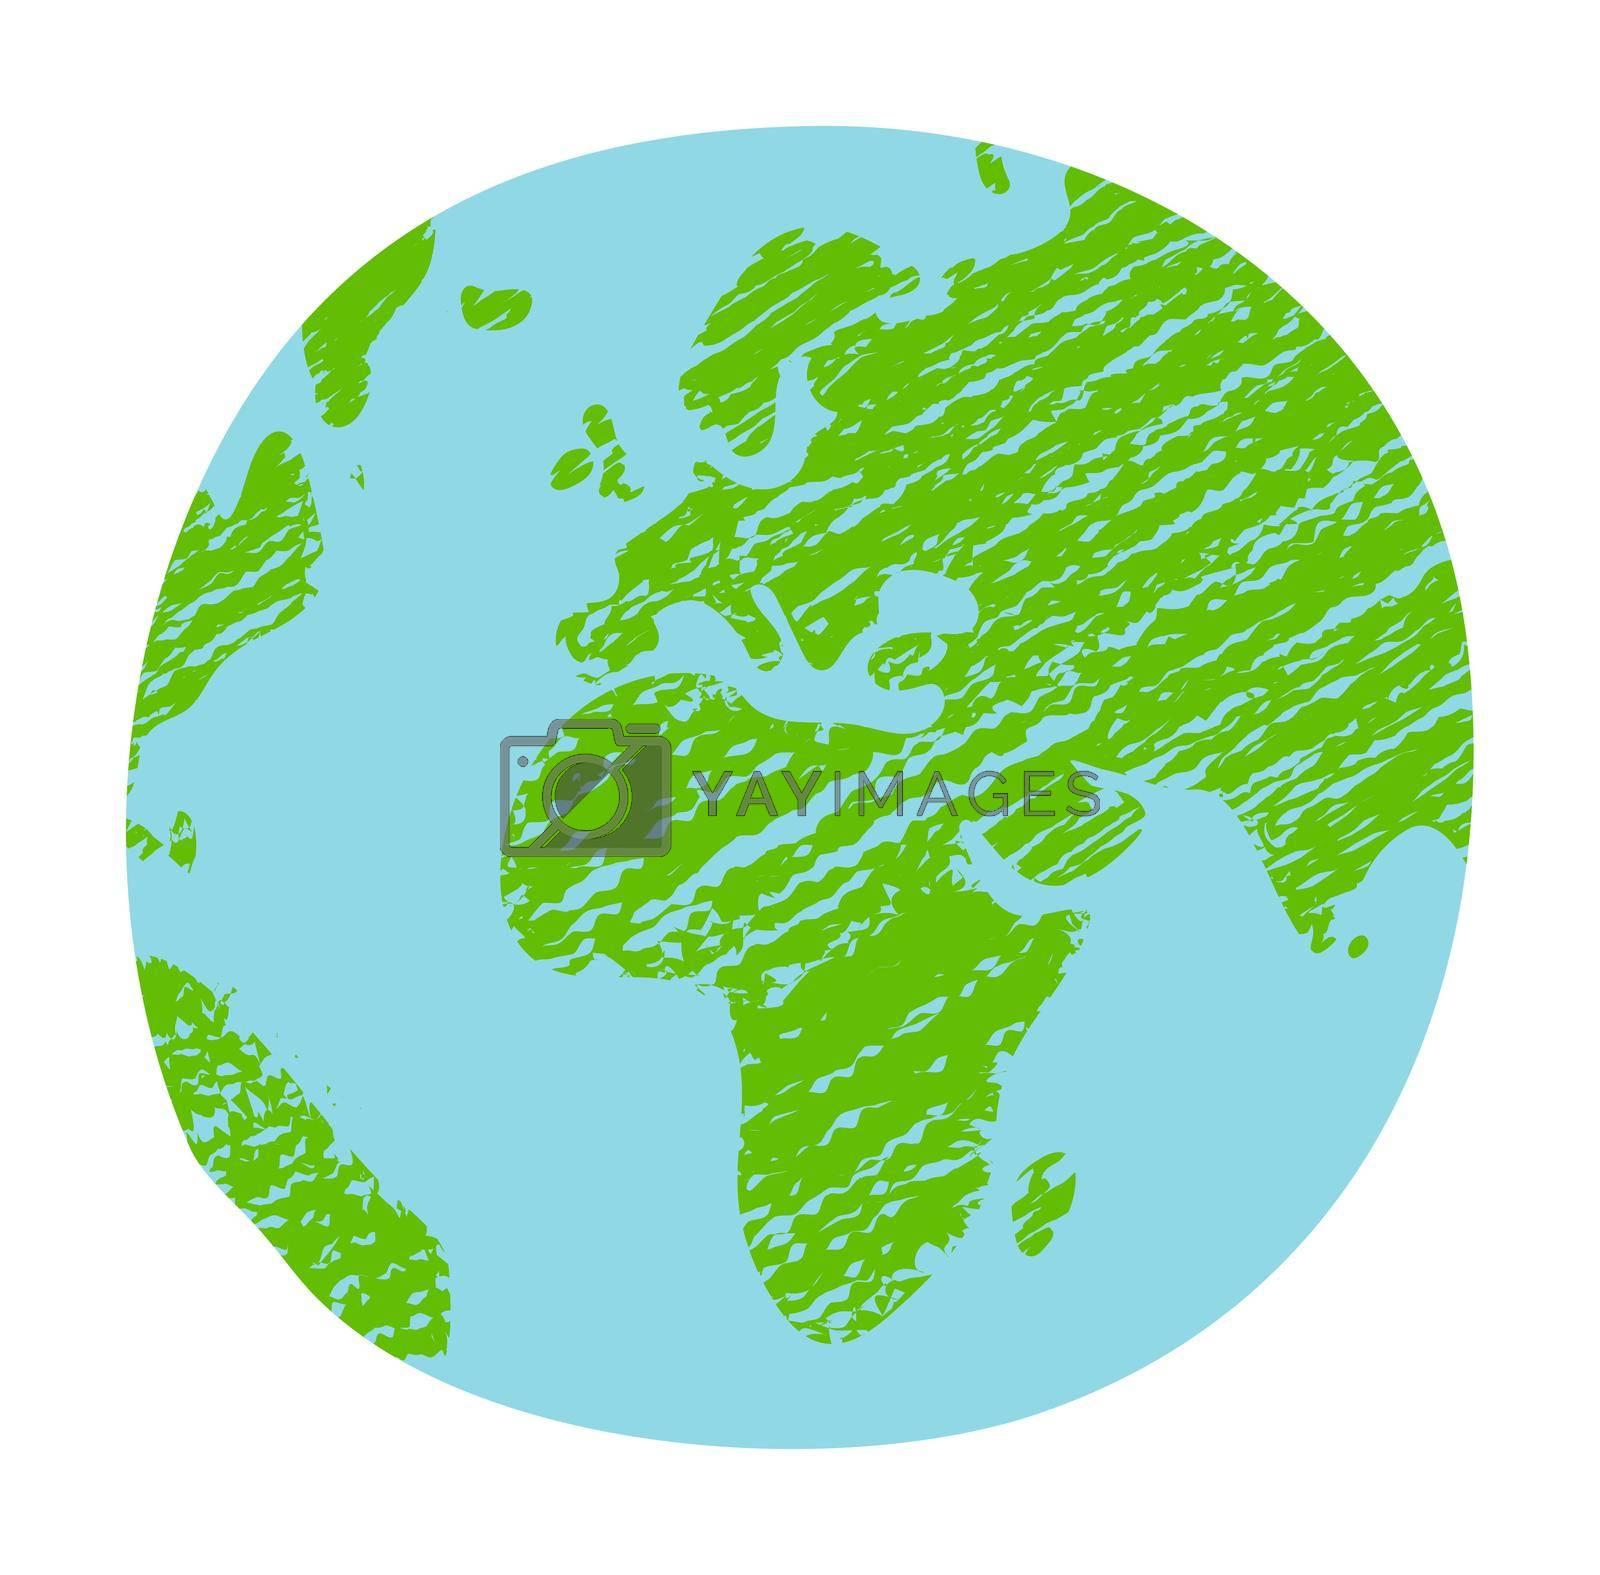 Chalked vector grunge earth (world map, globe)  illustration